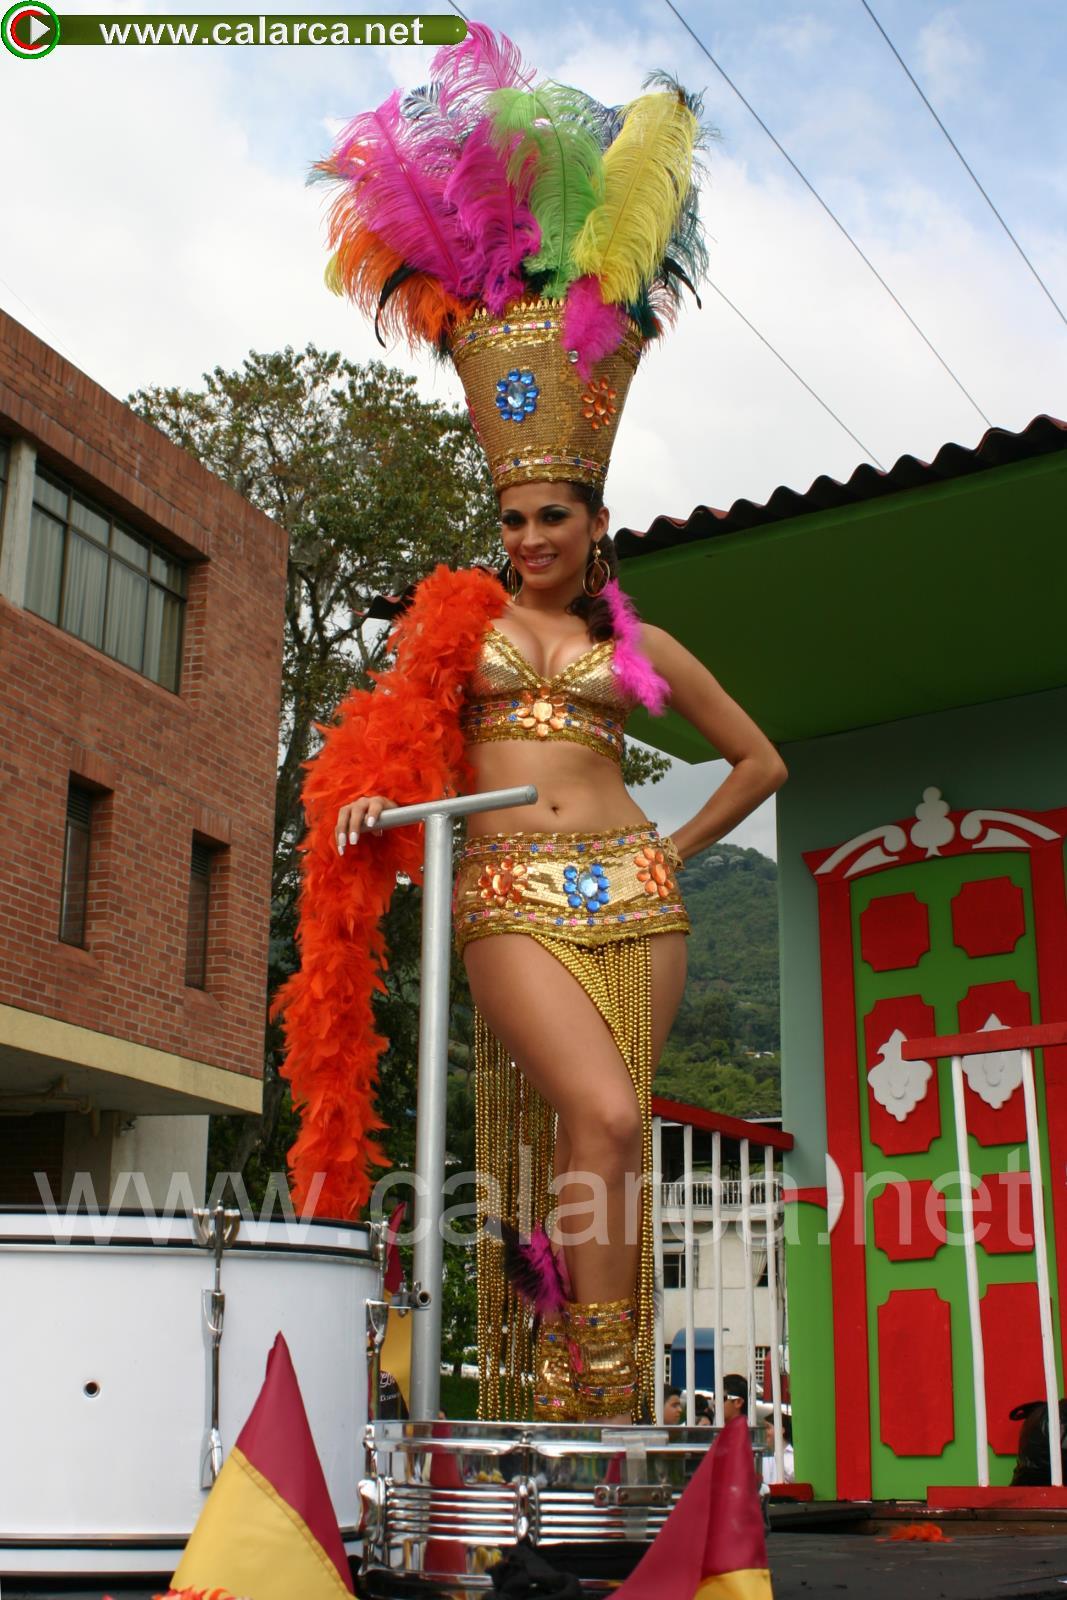 Tolima - Andrea Lizeth Lizarazo